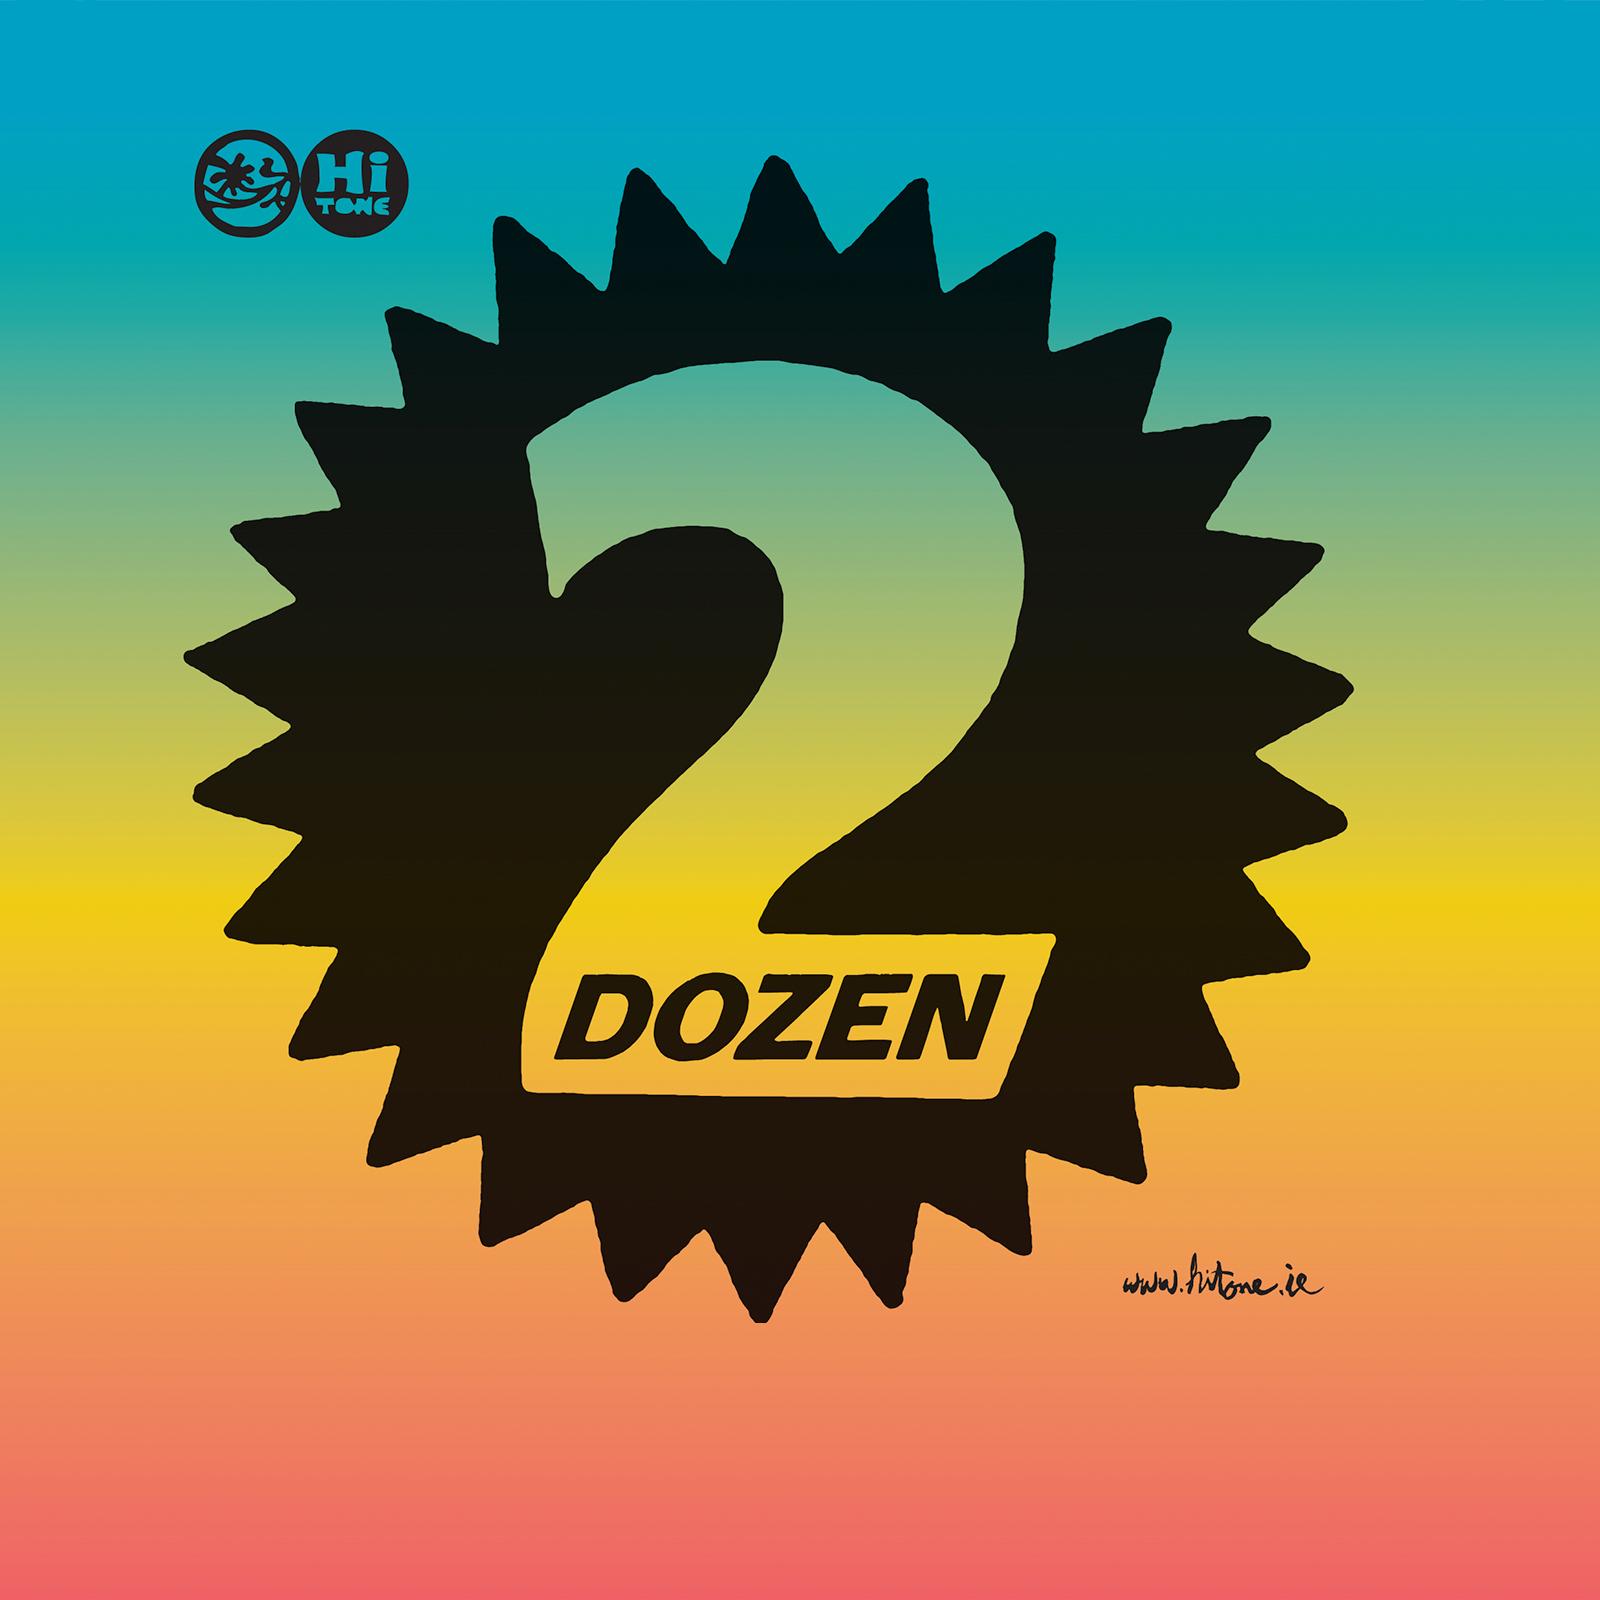 tues_20th_7pm_brhi_tone_and_umack_presents_two_dozen_exhibition_talk